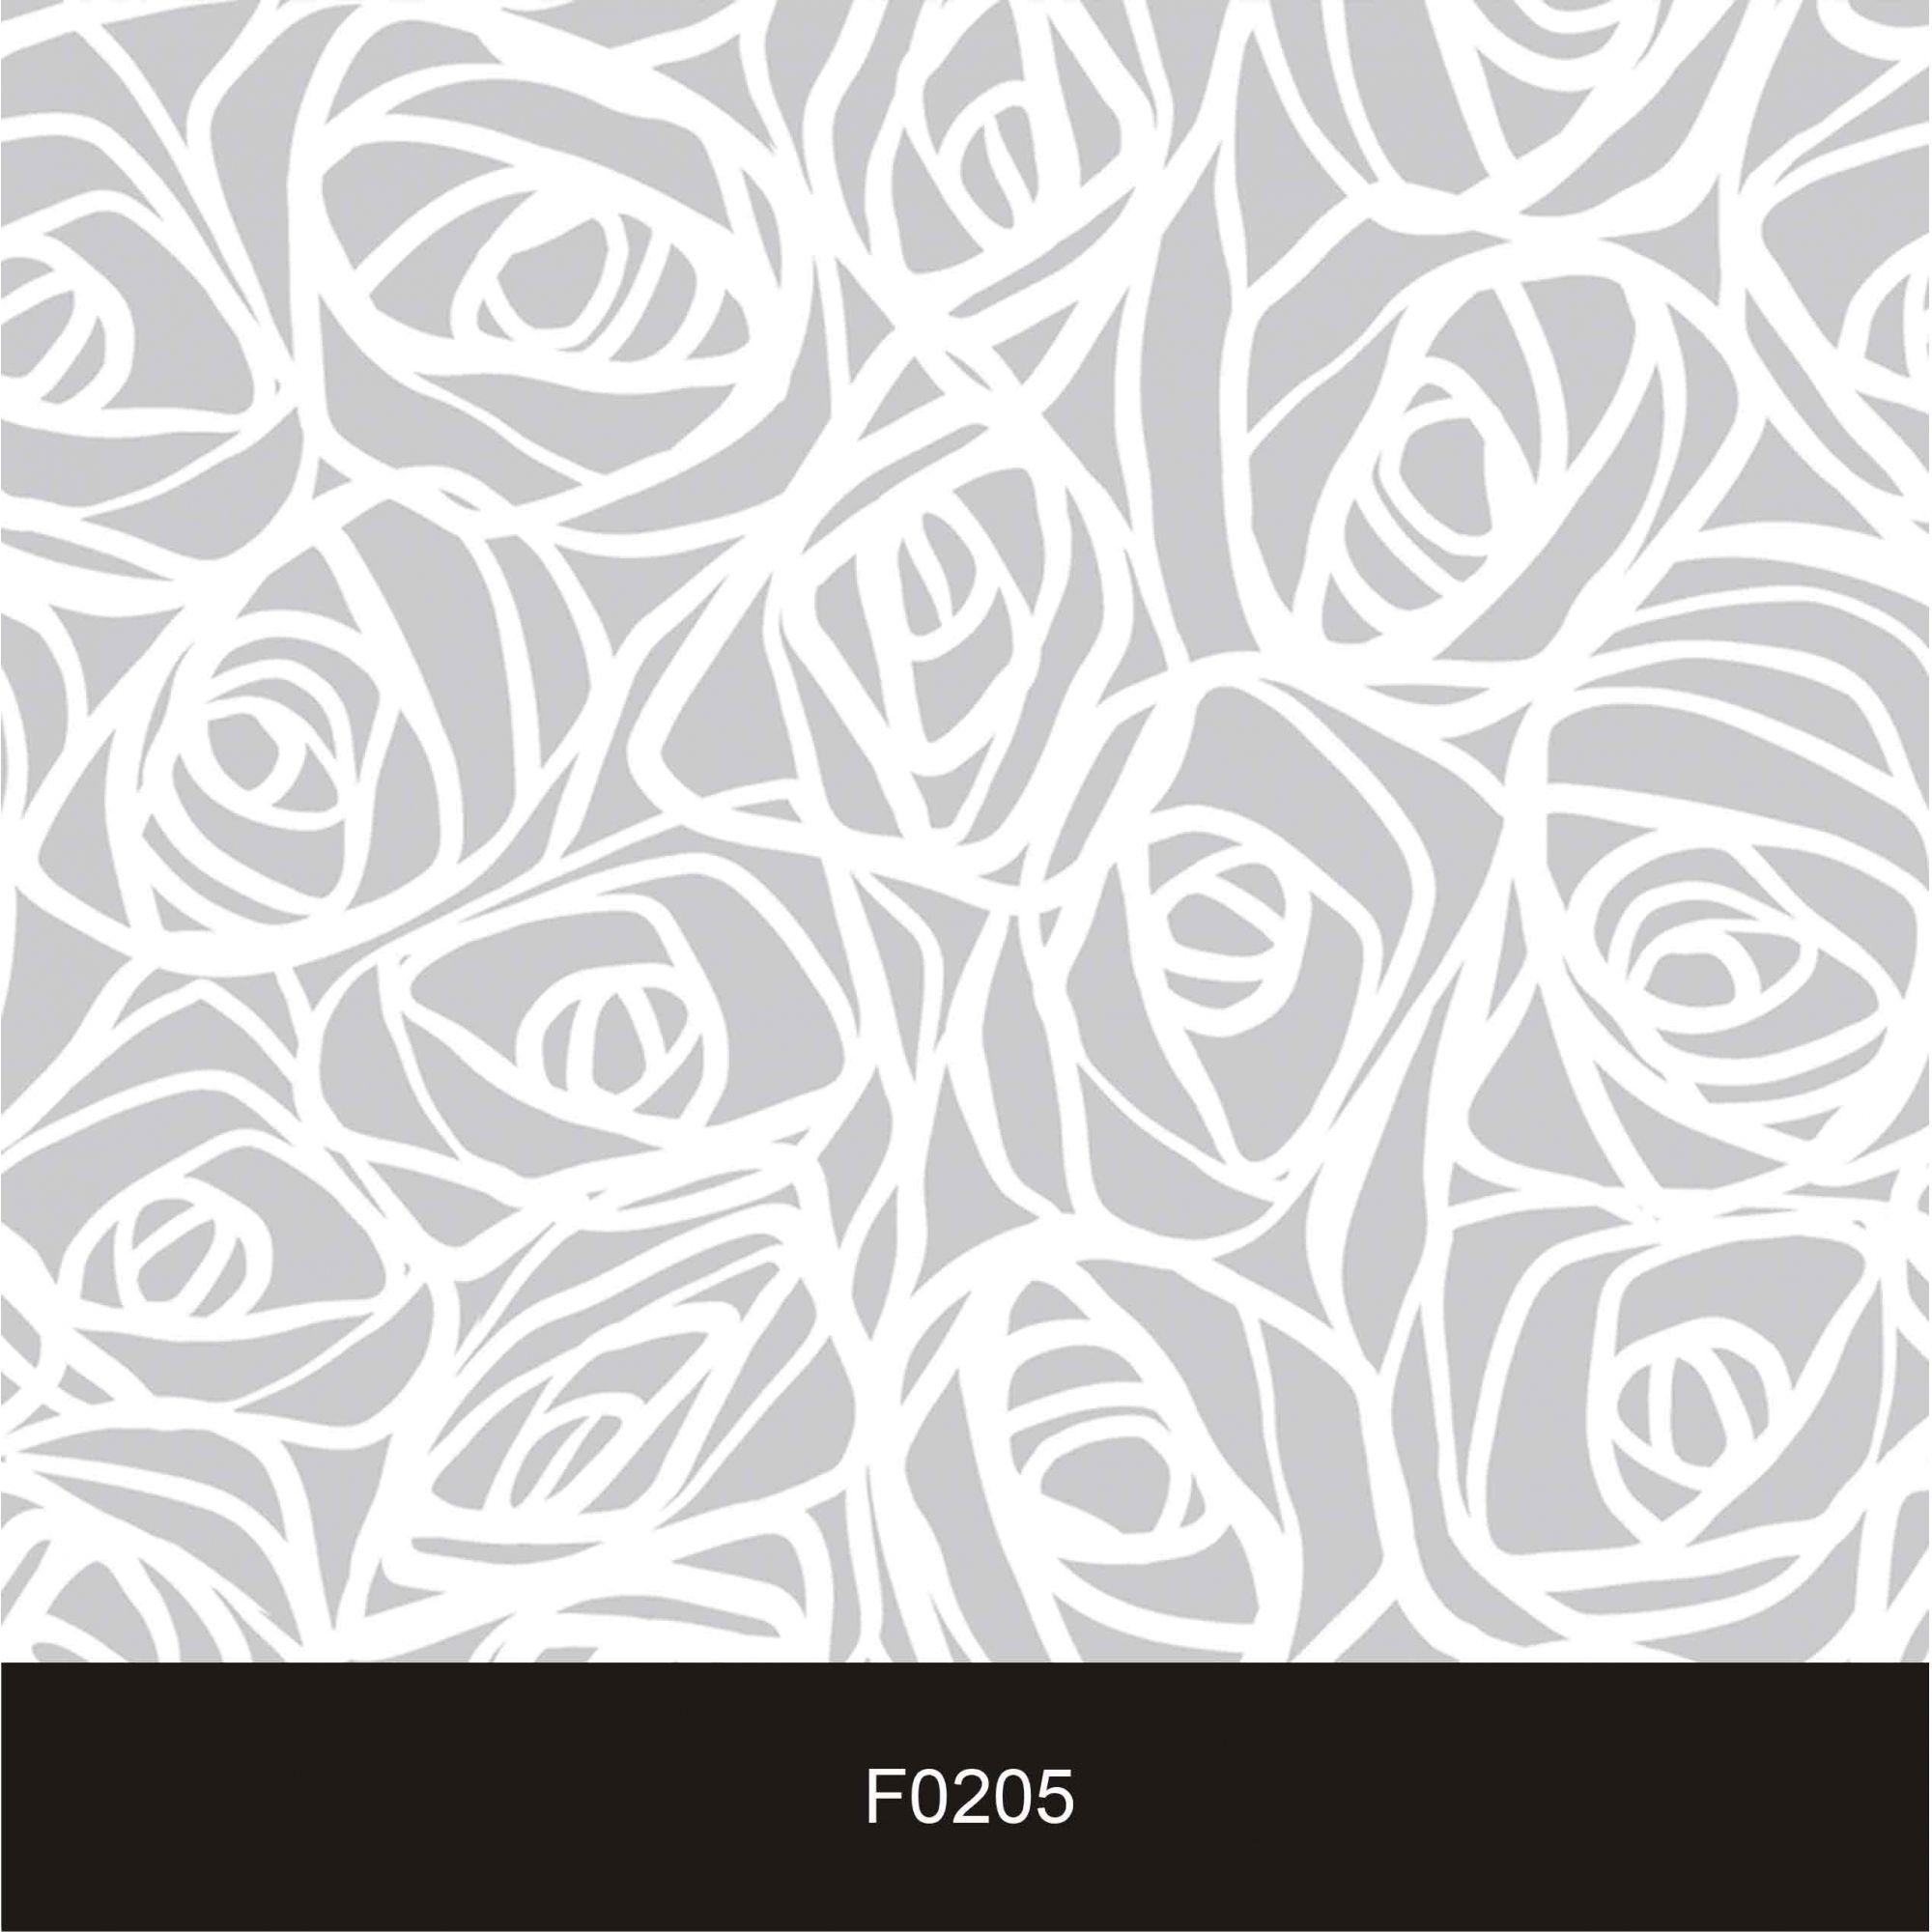 Papel de Parede Auto  Adesivo Floral, F205  Cinza e Branco Clean  - Final Decor